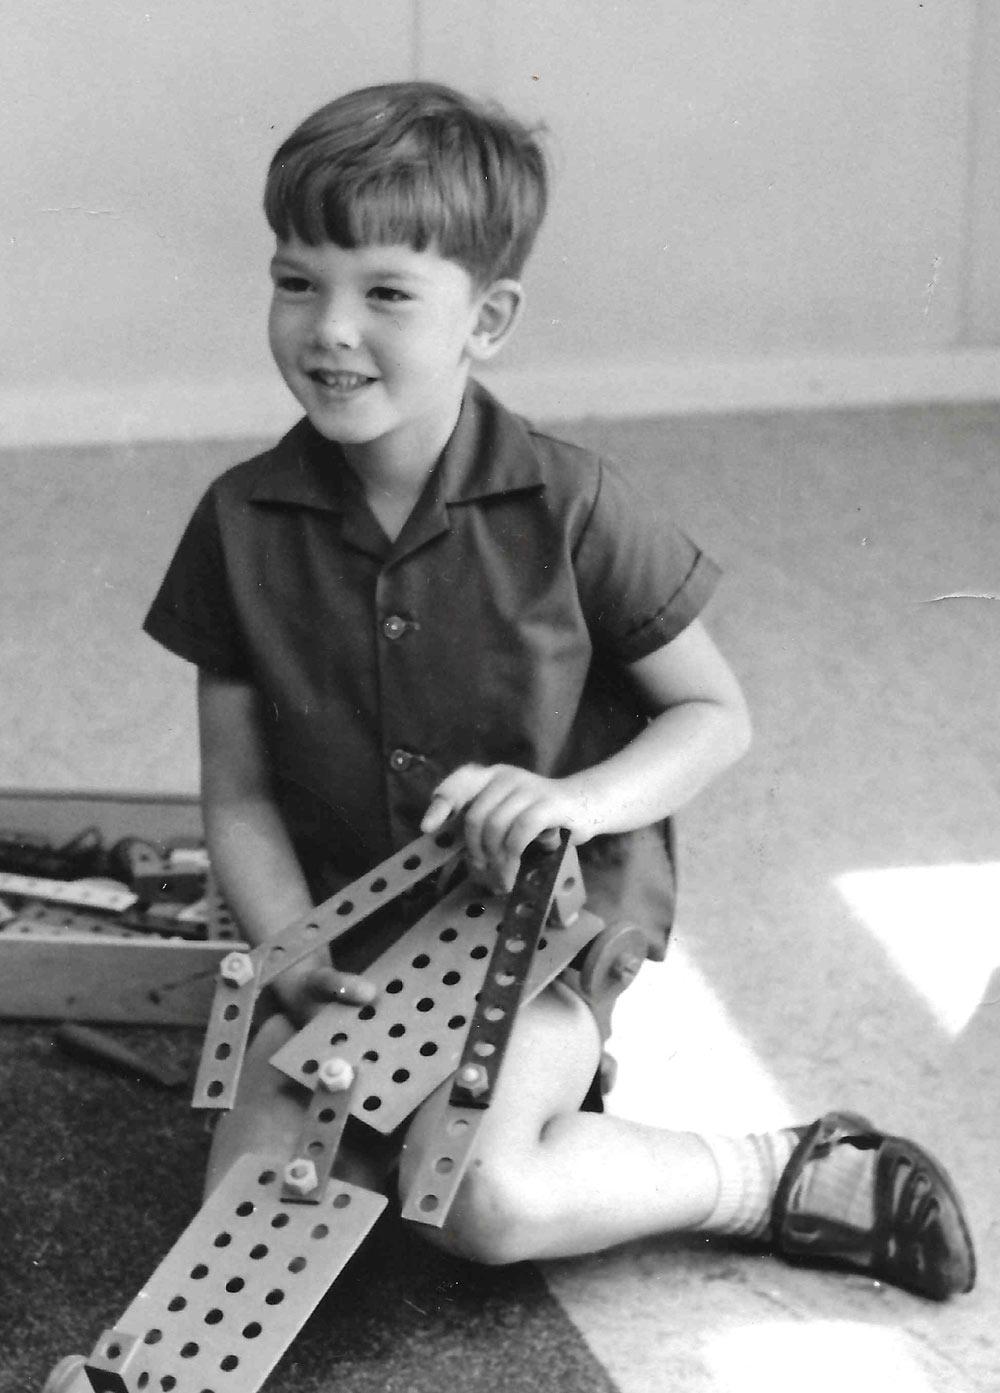 A young Eric Quint